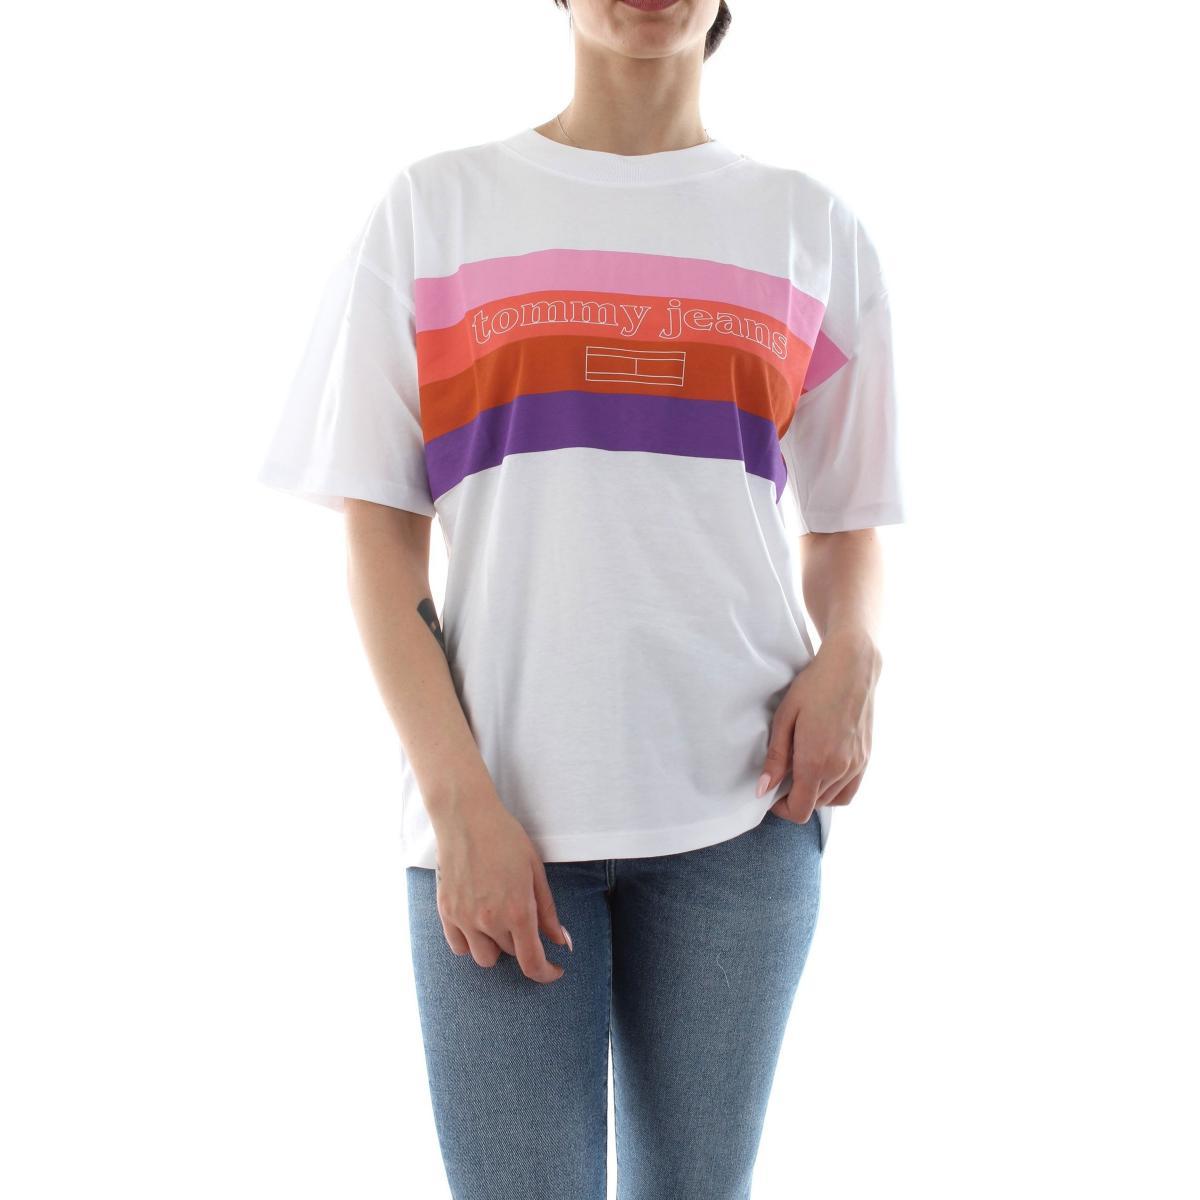 T-shirt Tommy Hilfiger Jeans con stampa colorblock da donna rif. DW0DW06719